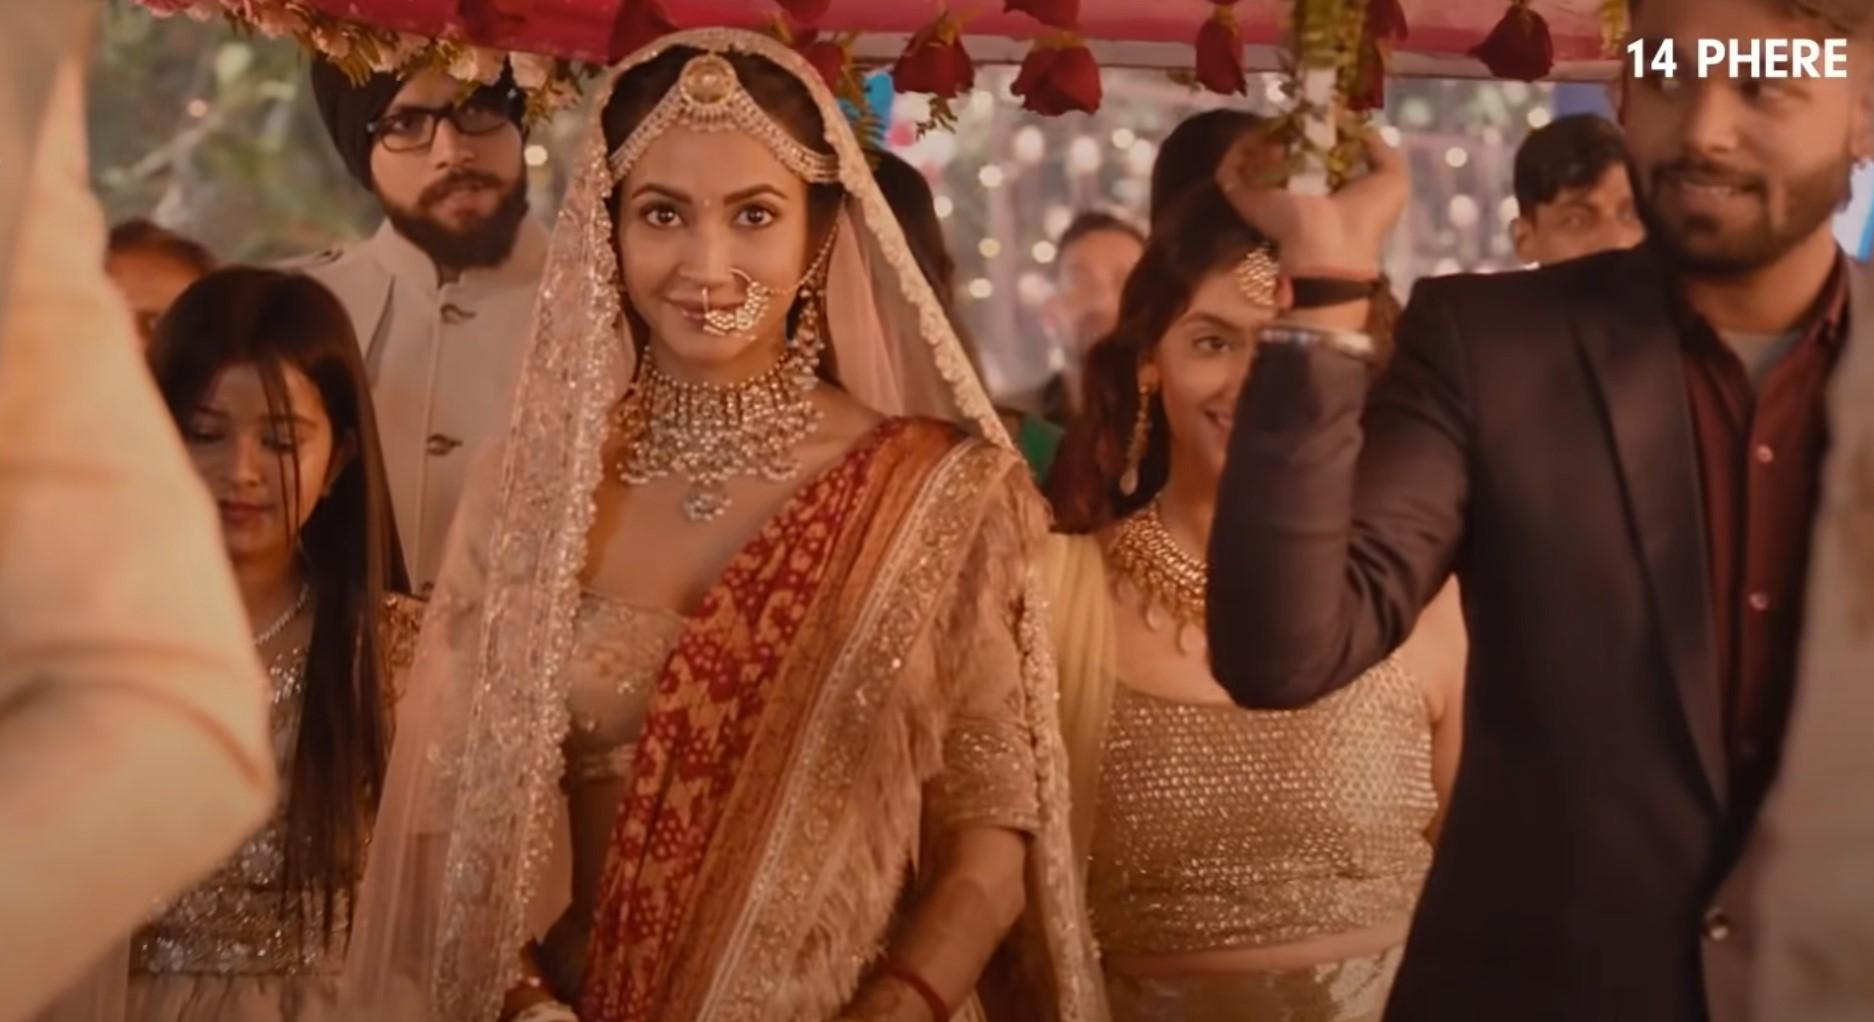 14 Phere Watch Full Movie Online For Free! Vikrant Massey & Kriti Kharbanda